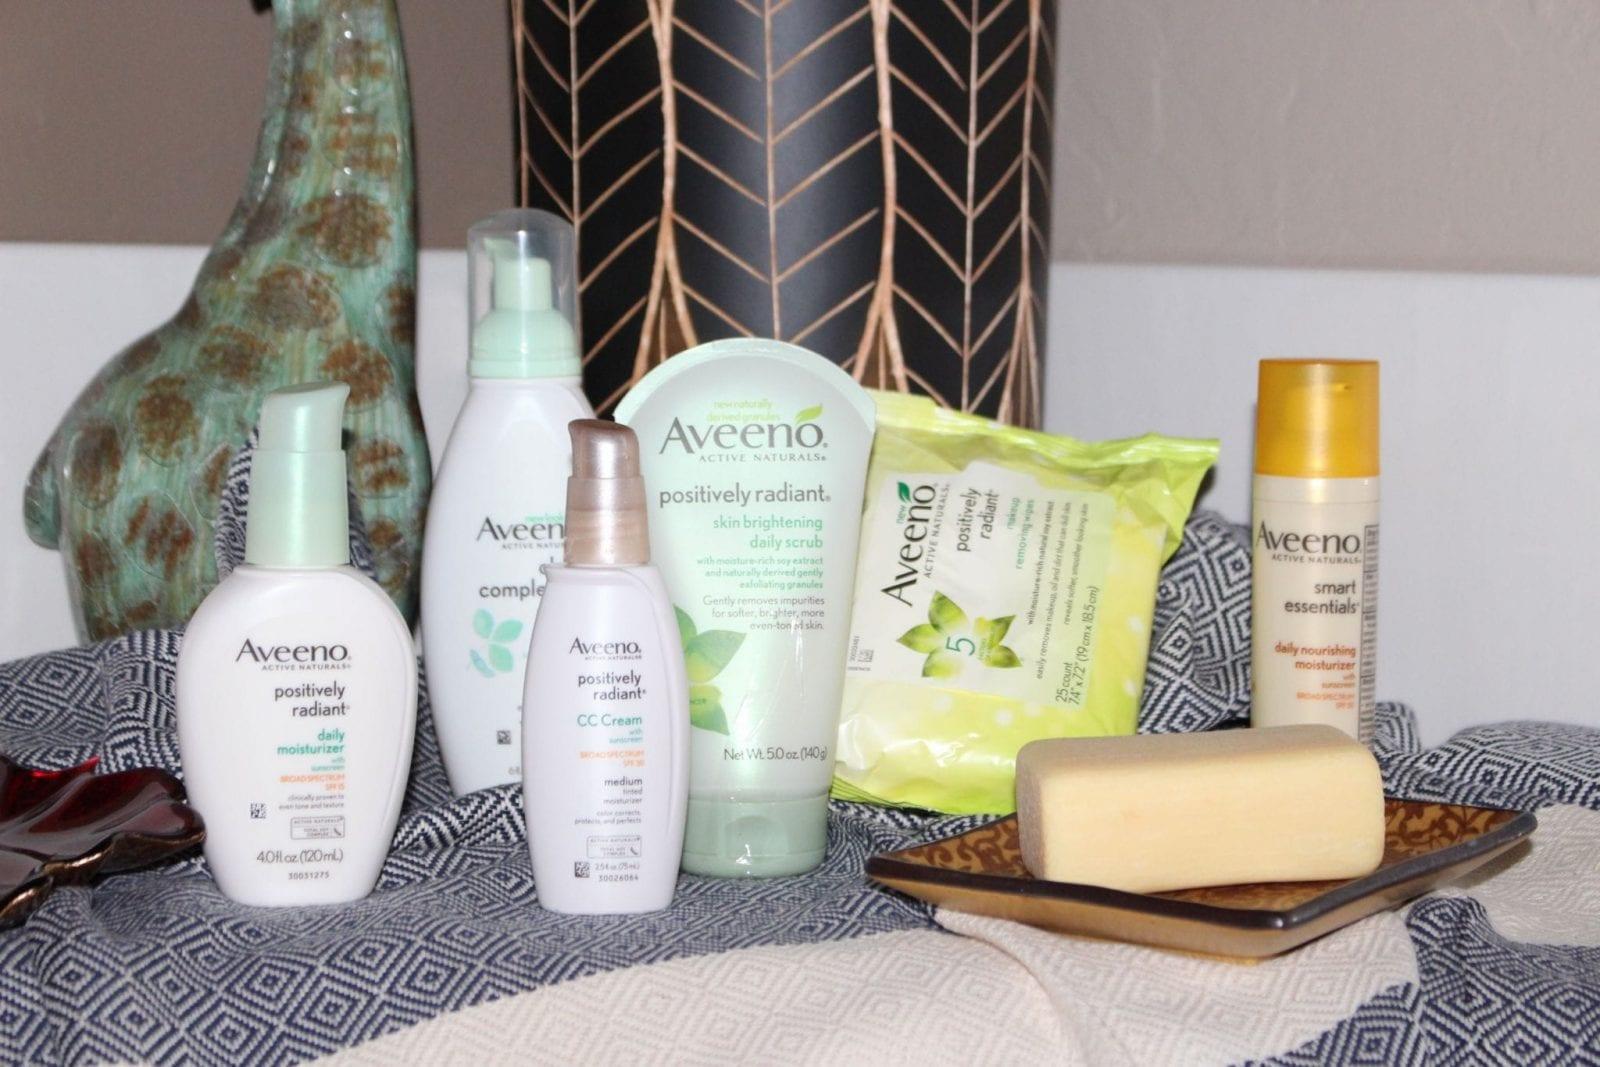 Rocking Aveeno Skincare from iHerb